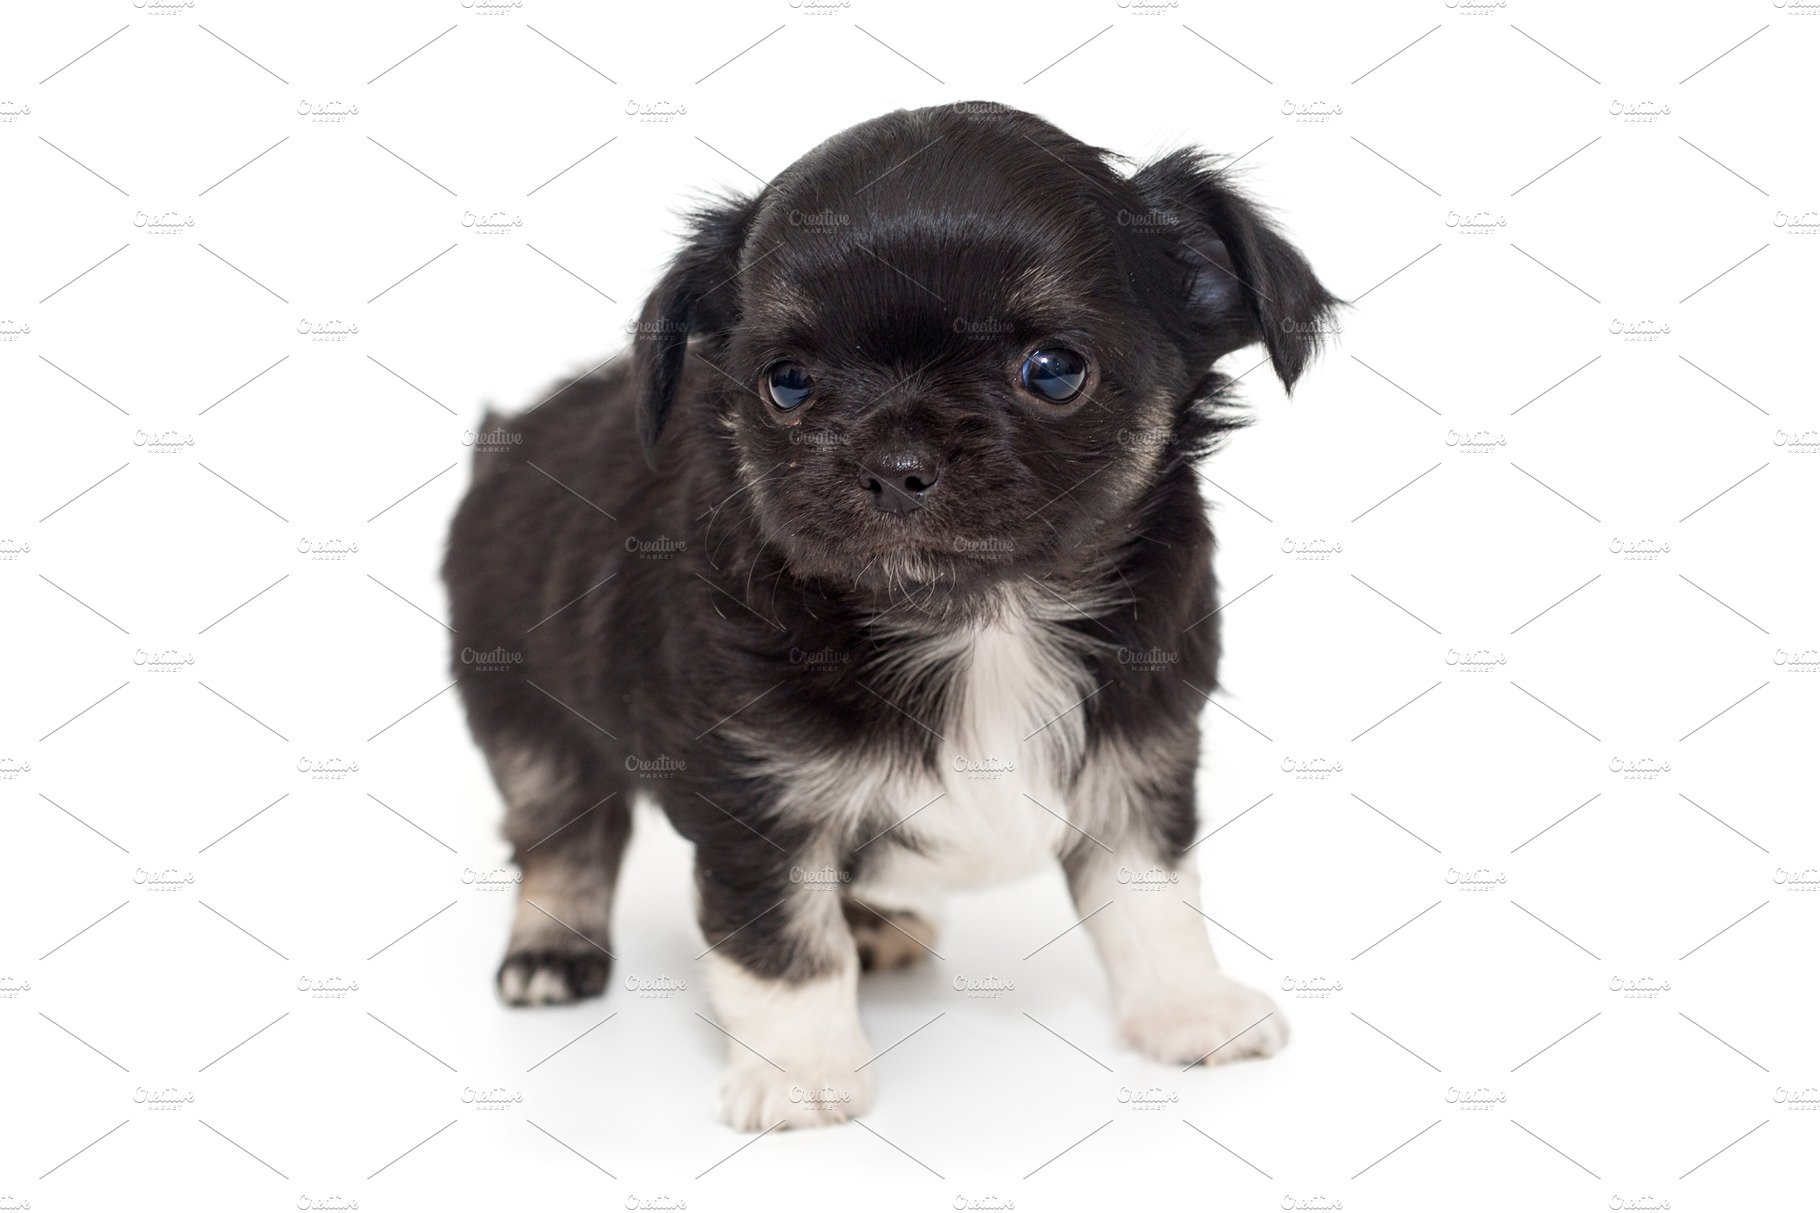 Small Black Chihuahua Puppy High Quality Stock Photos Creative Market